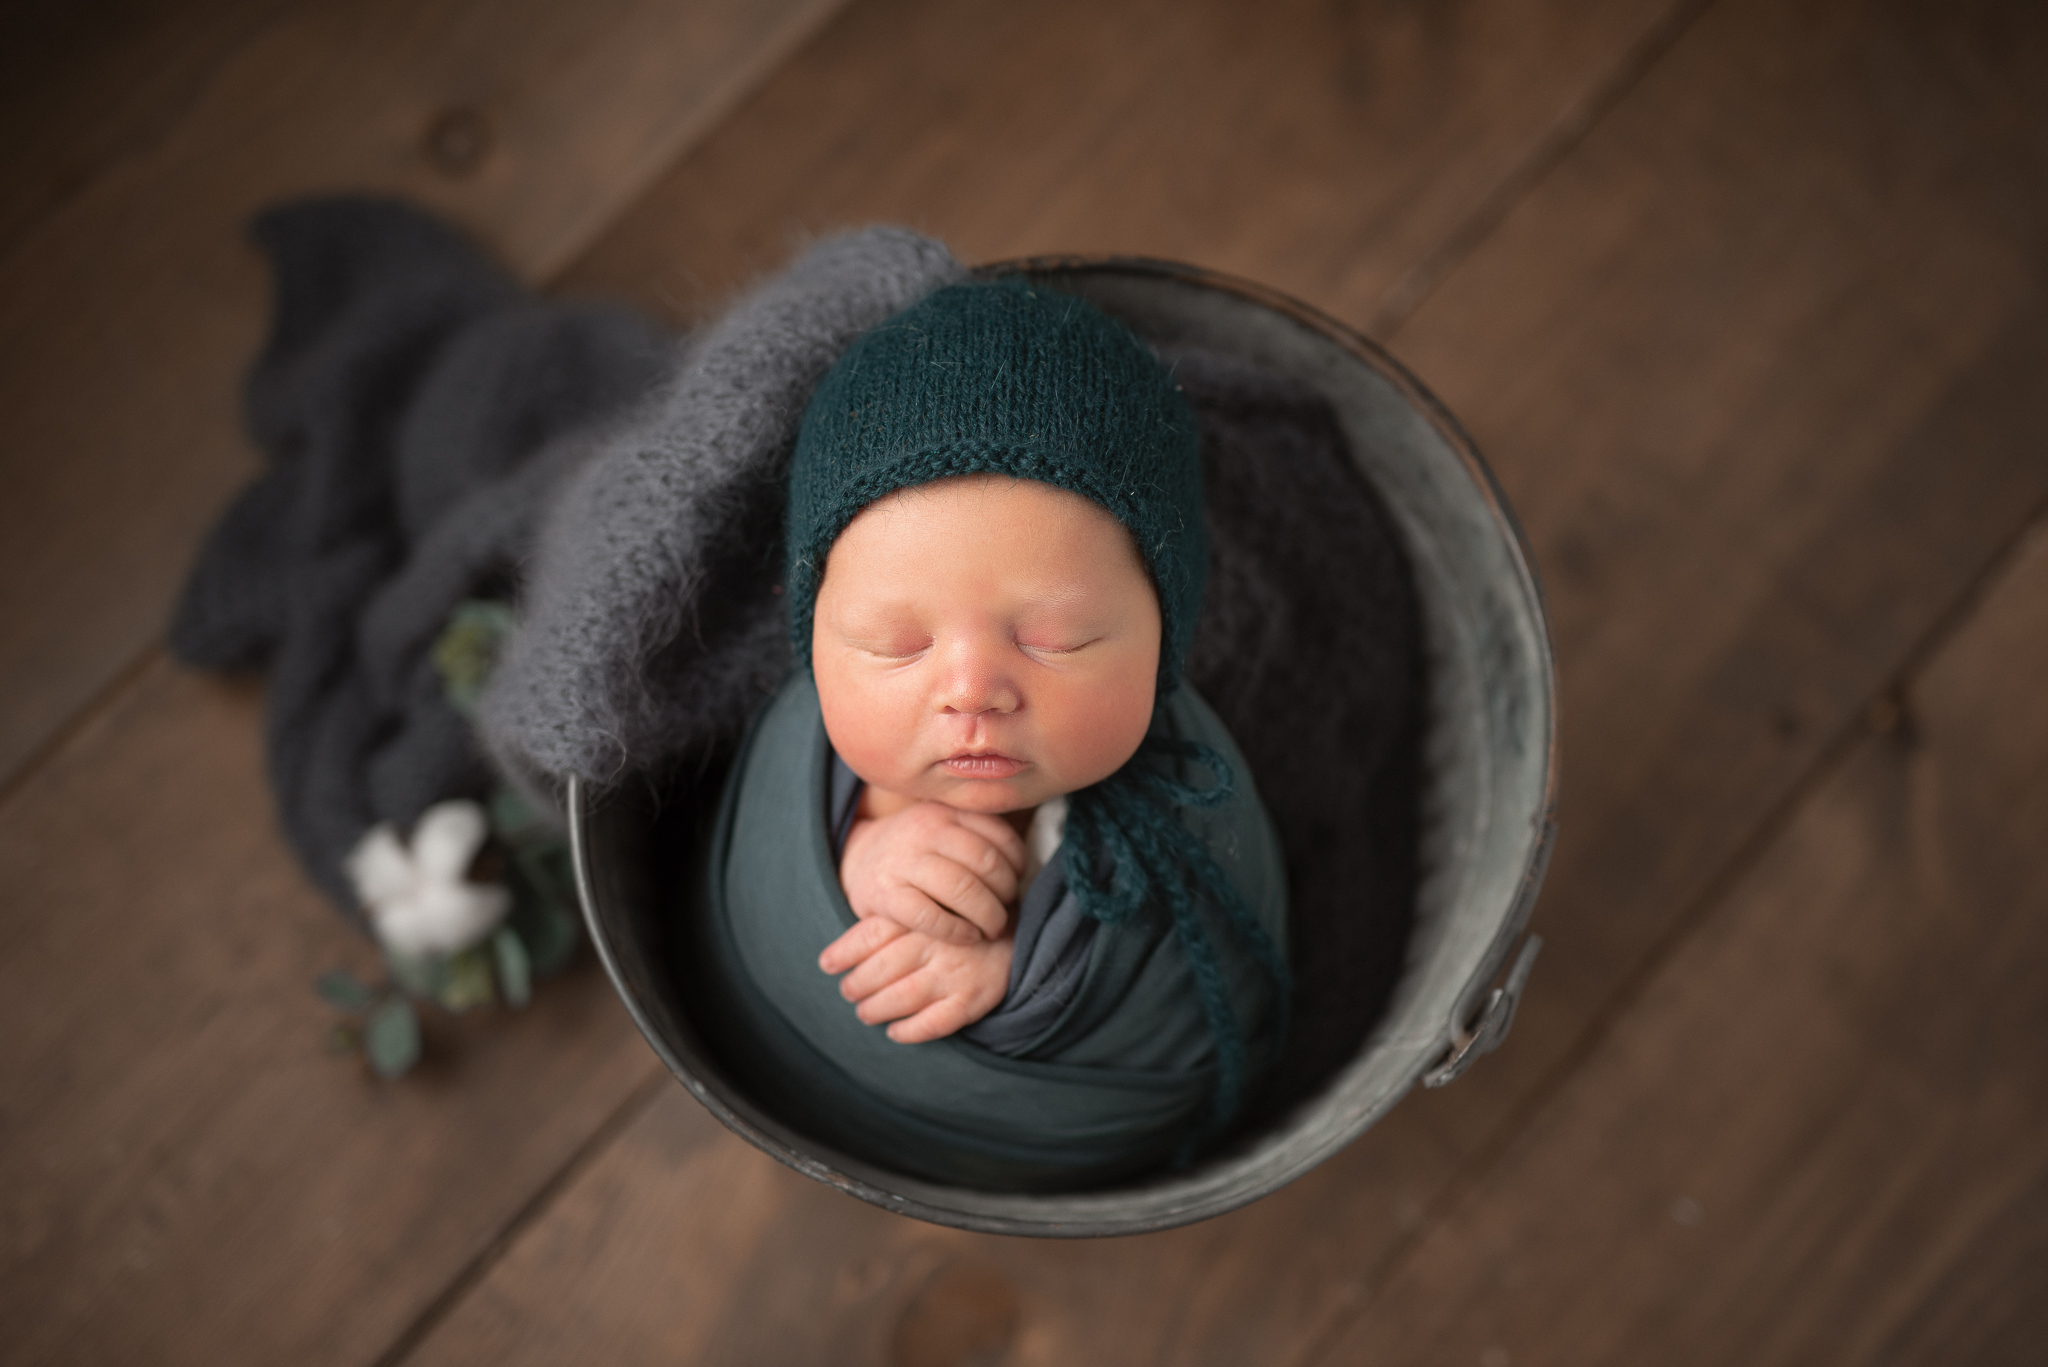 Newborn452NaomiLuciennePhotography032019-Edit.jpg